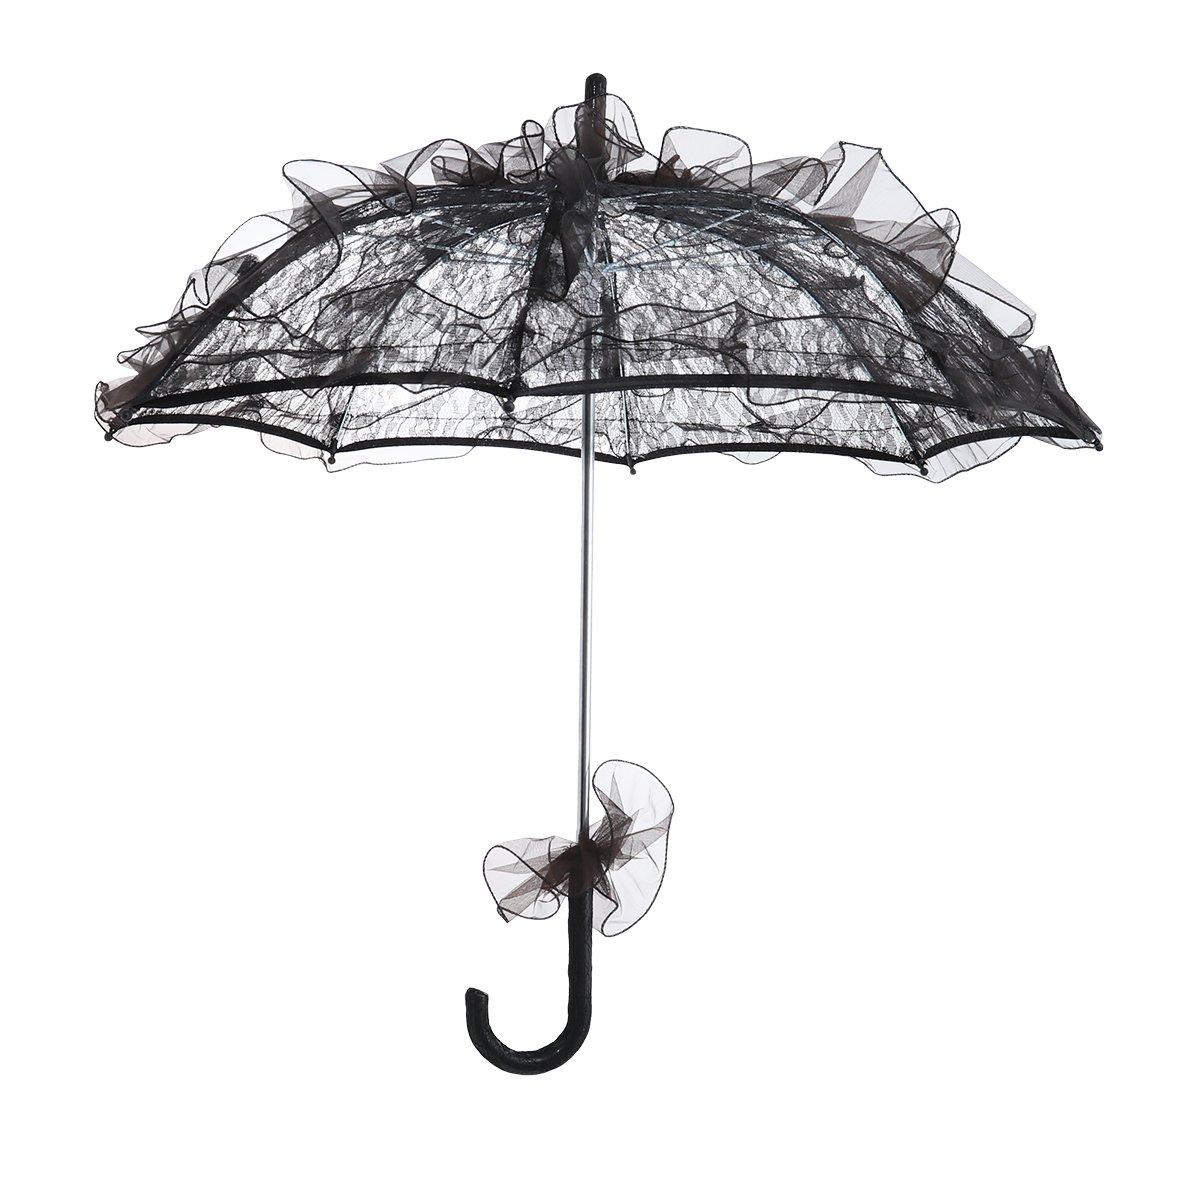 BESTOYARD Stylish Western Style Umbrella Lace Fleur Parasol Decoration Wedding Bride Umbrella - Size Small (Black)